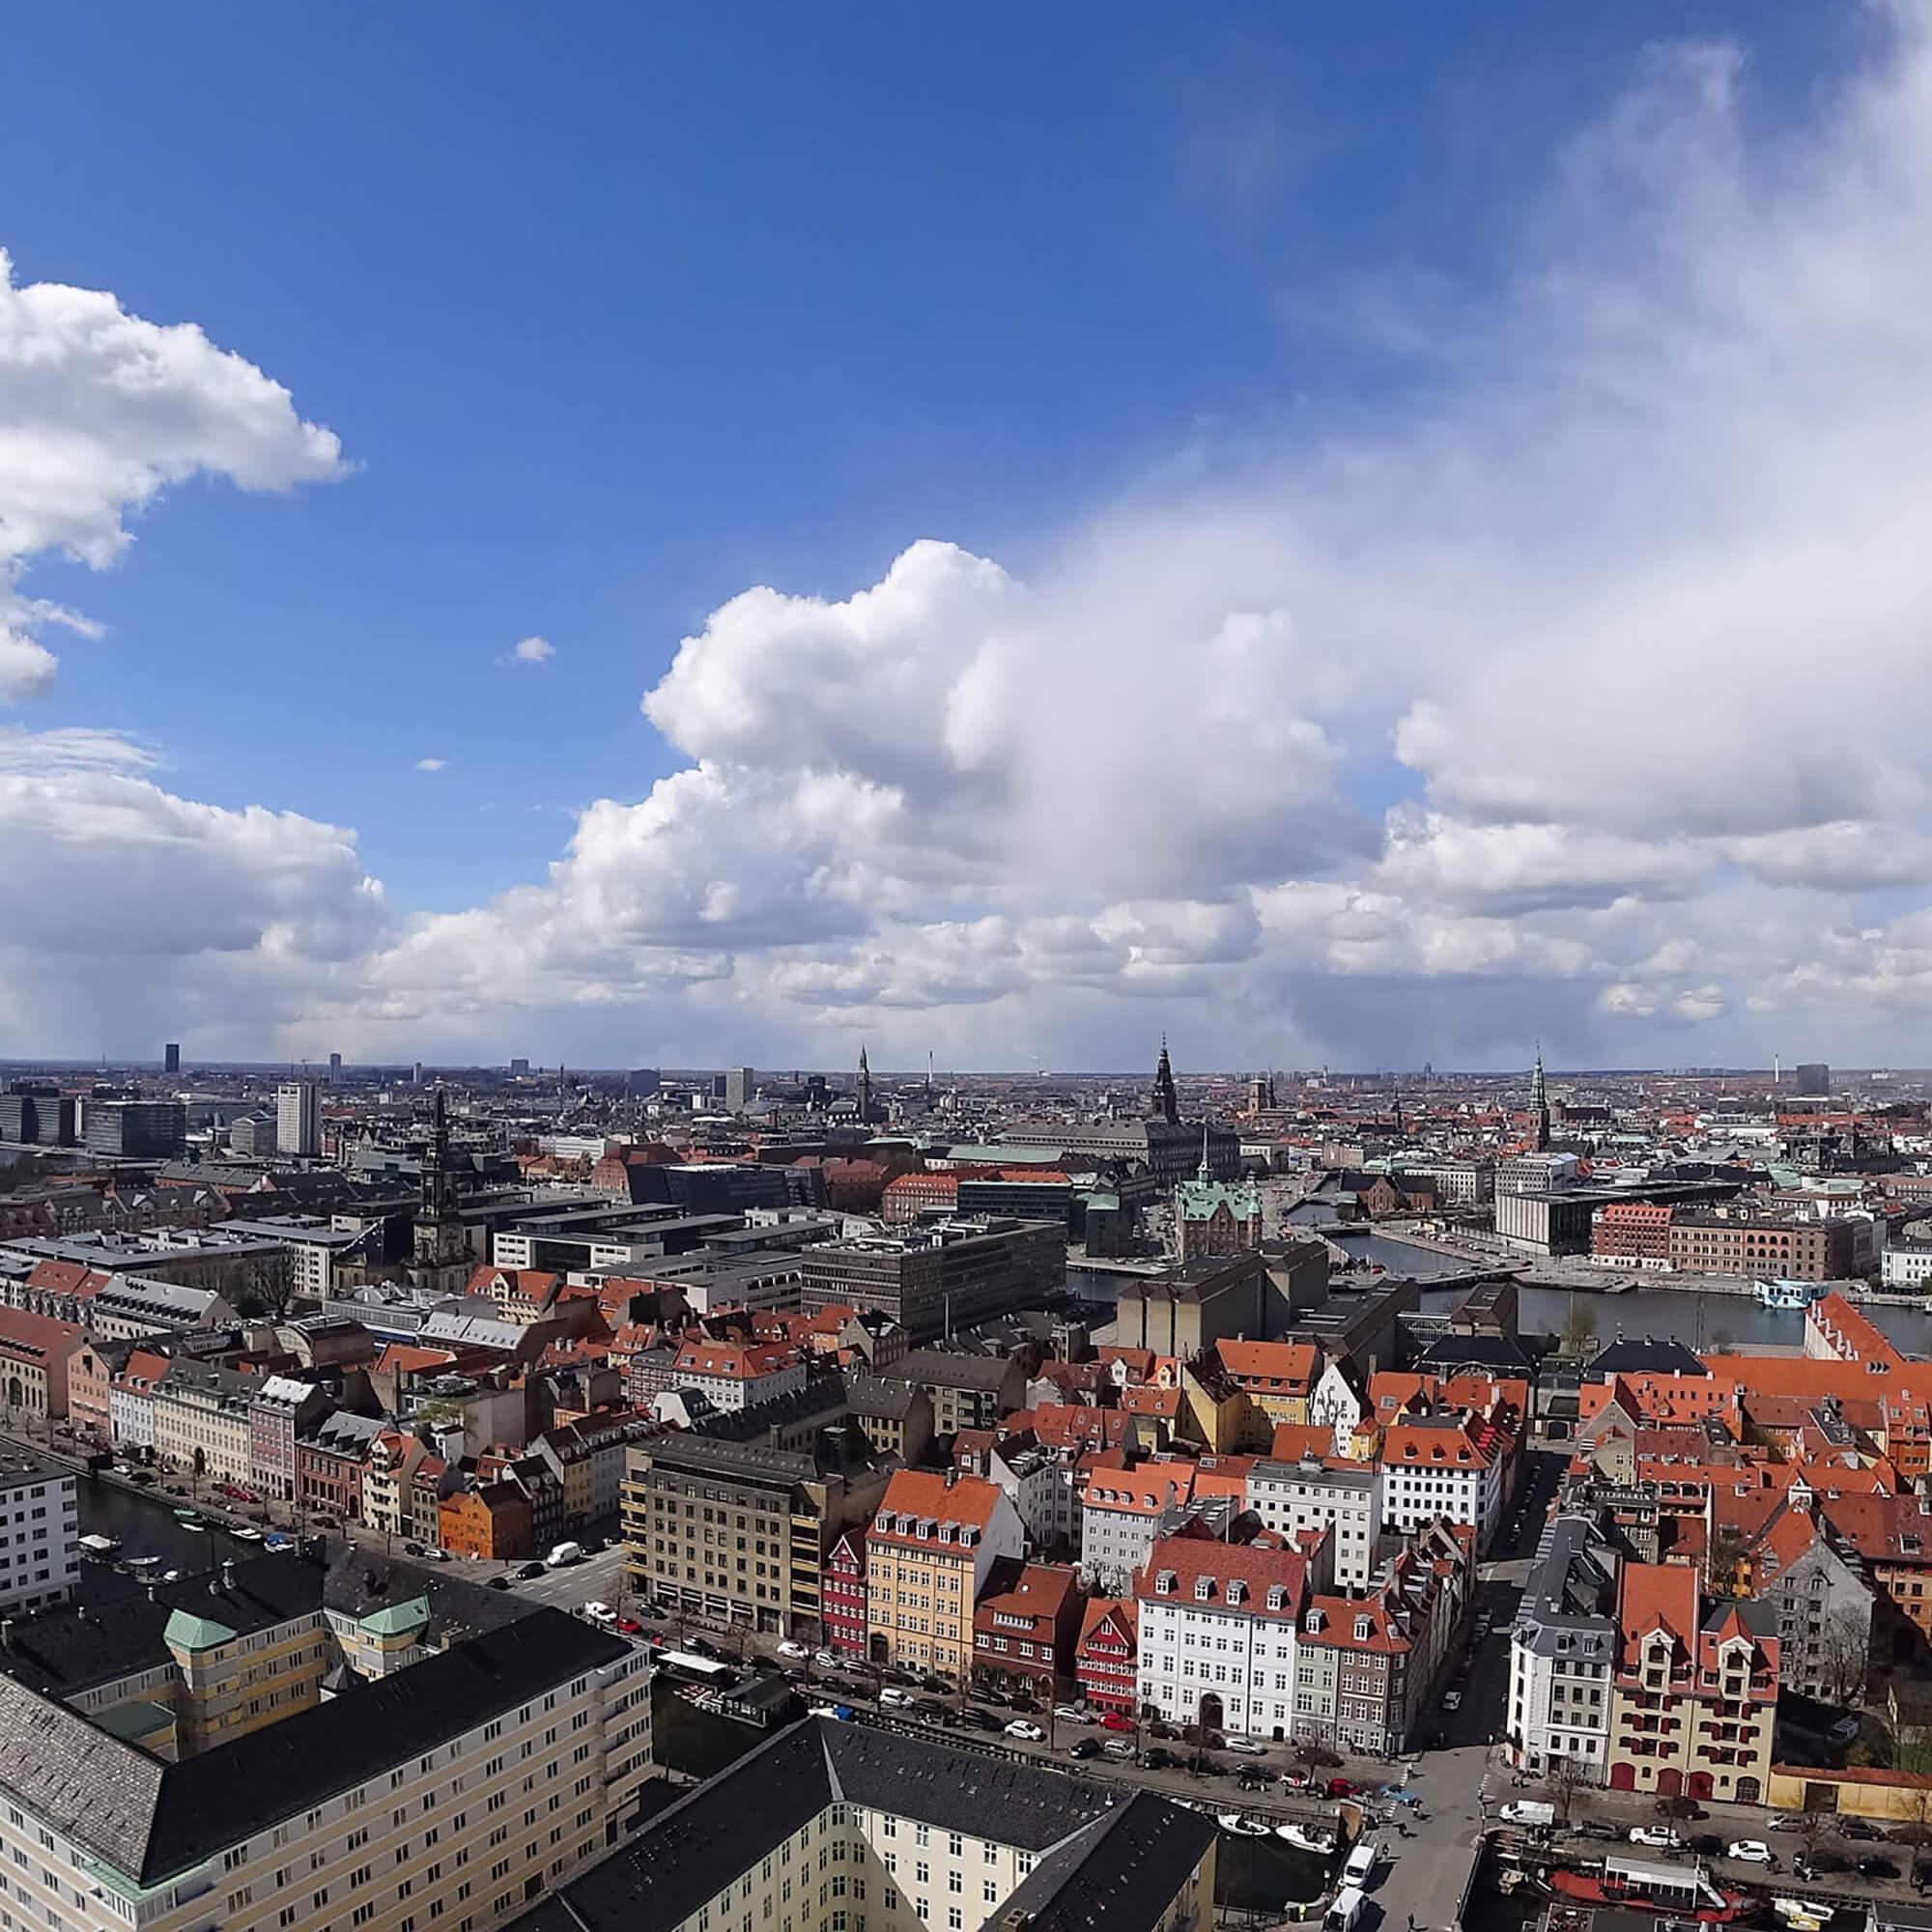 City buildings in Denmark